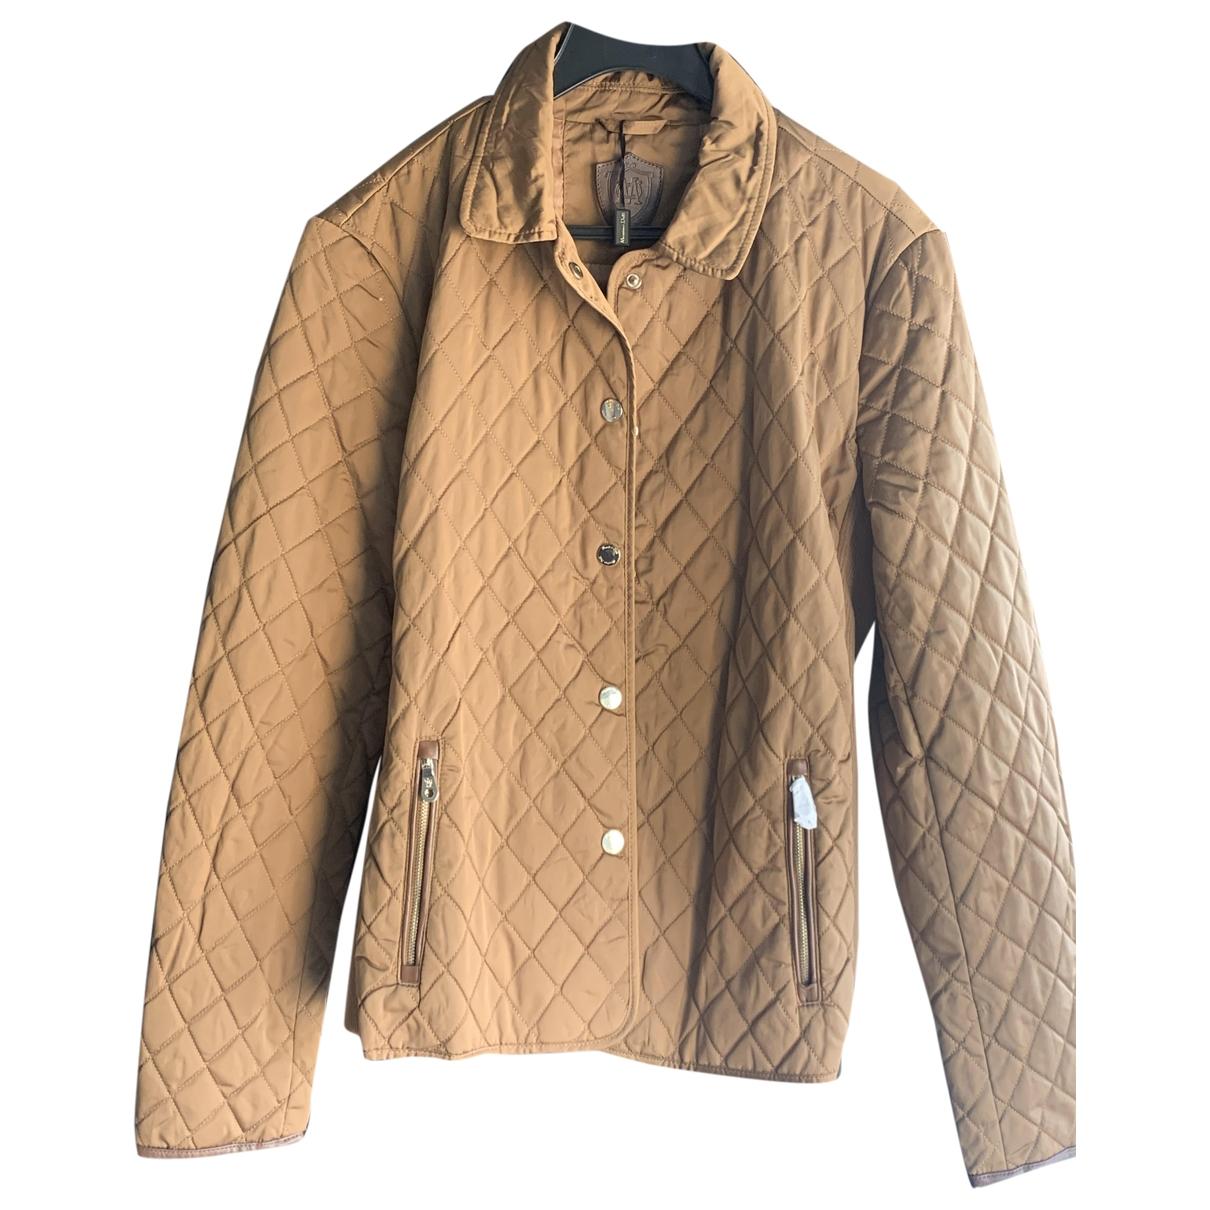 Massimo Dutti \N Jacke in  Khaki Polyester